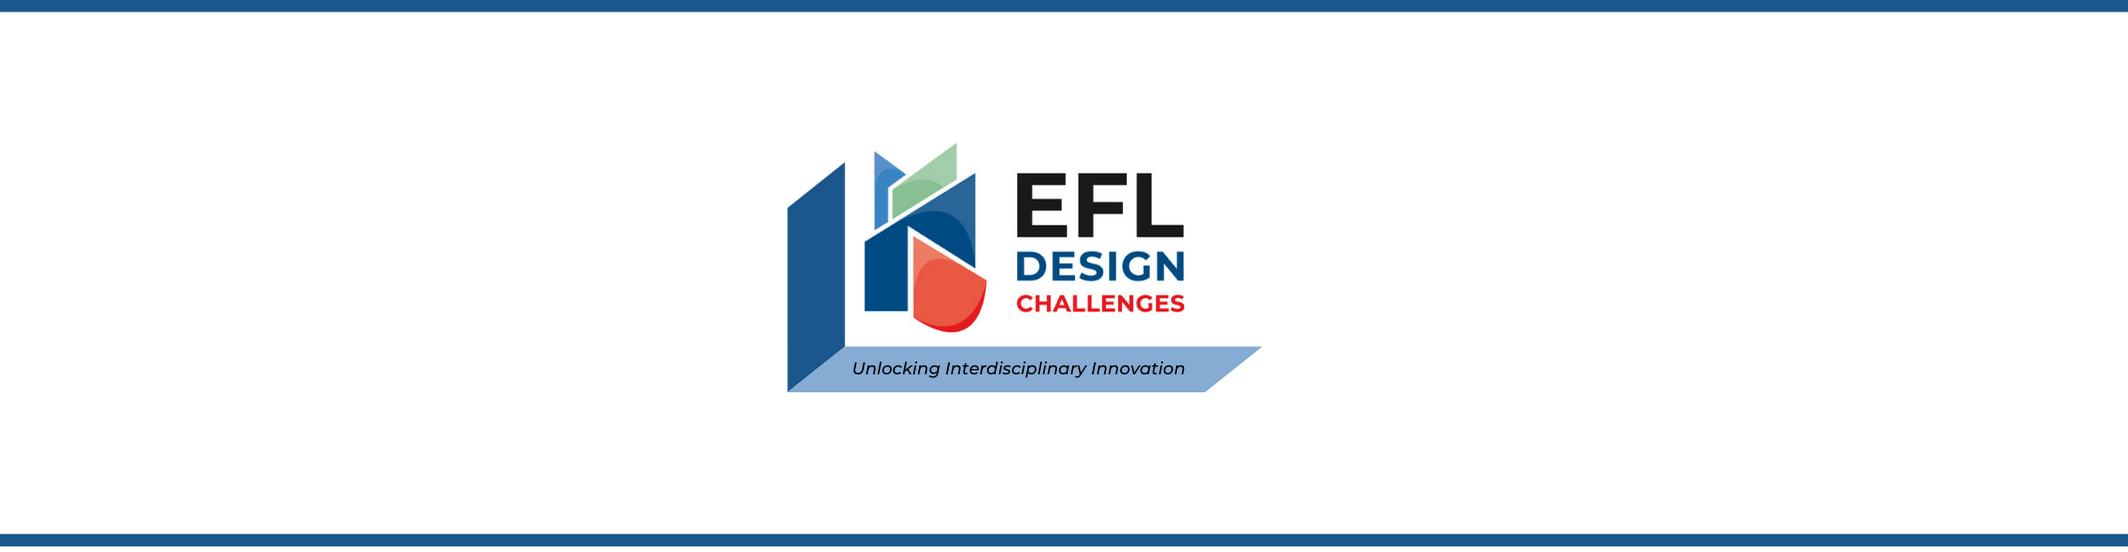 Efl photos year plan and website (4)